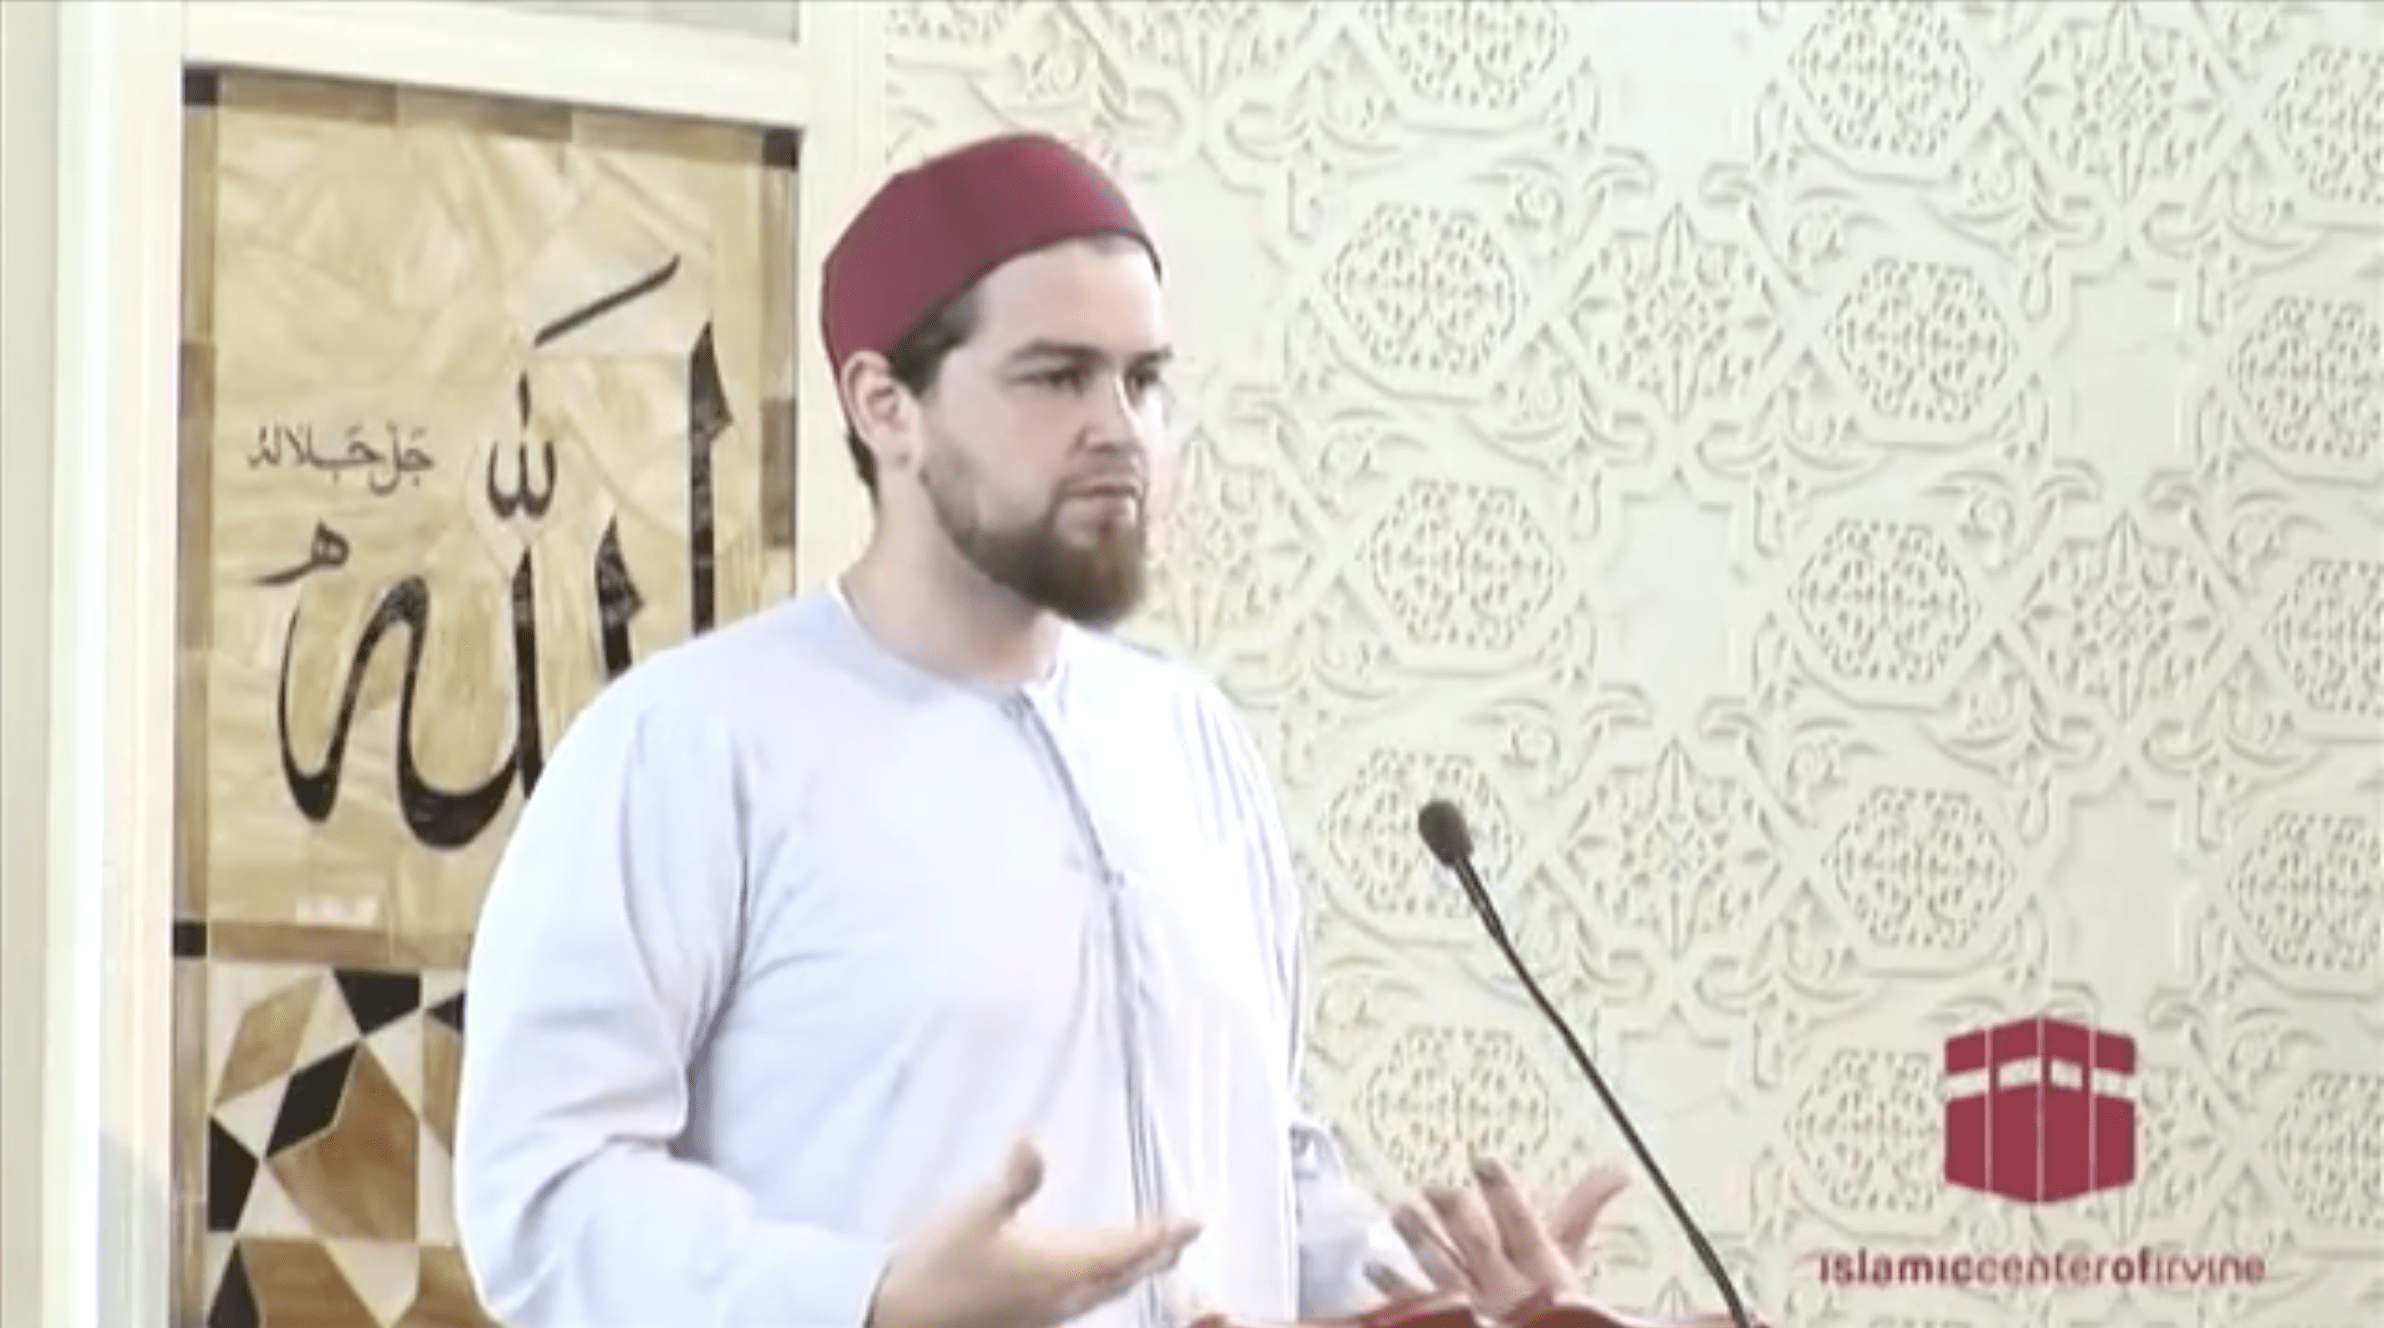 AbdelRahman Murphy – Dealing With Difficult Times